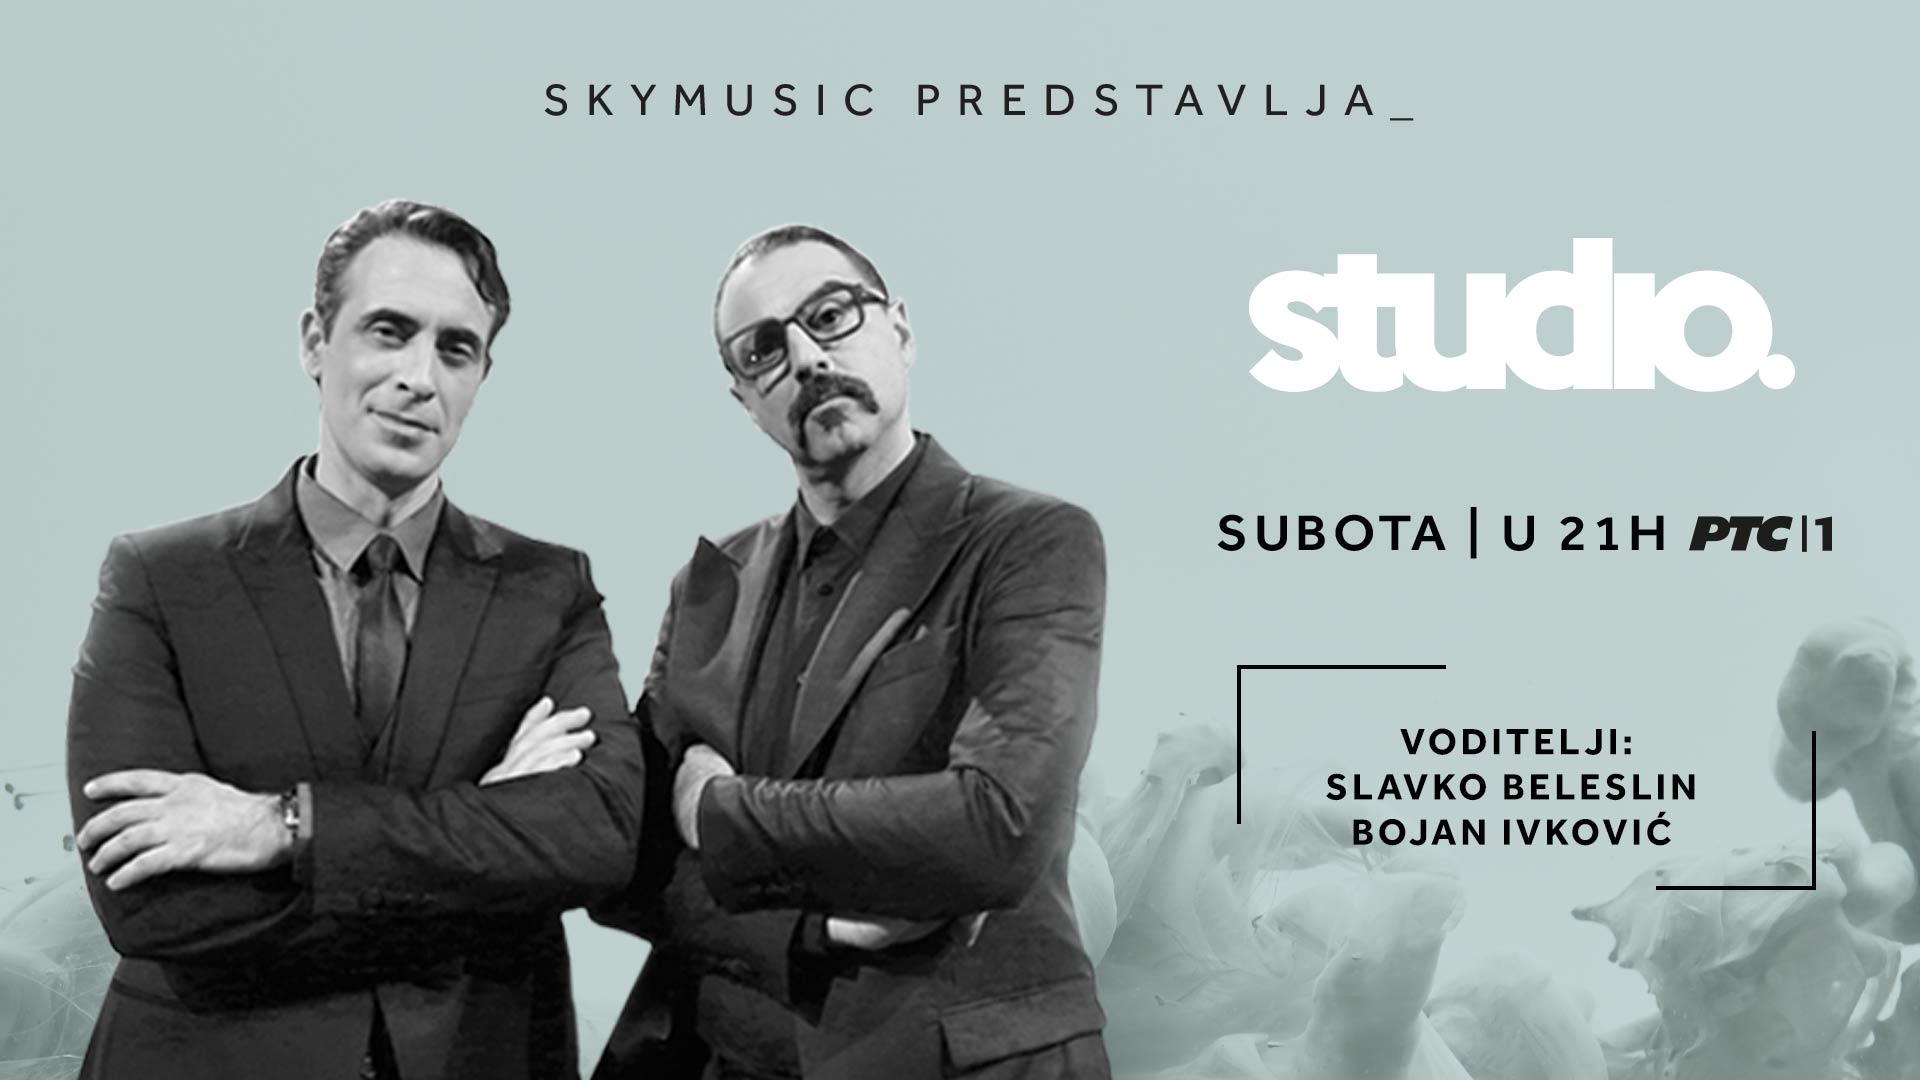 Welcome to STUDIO!